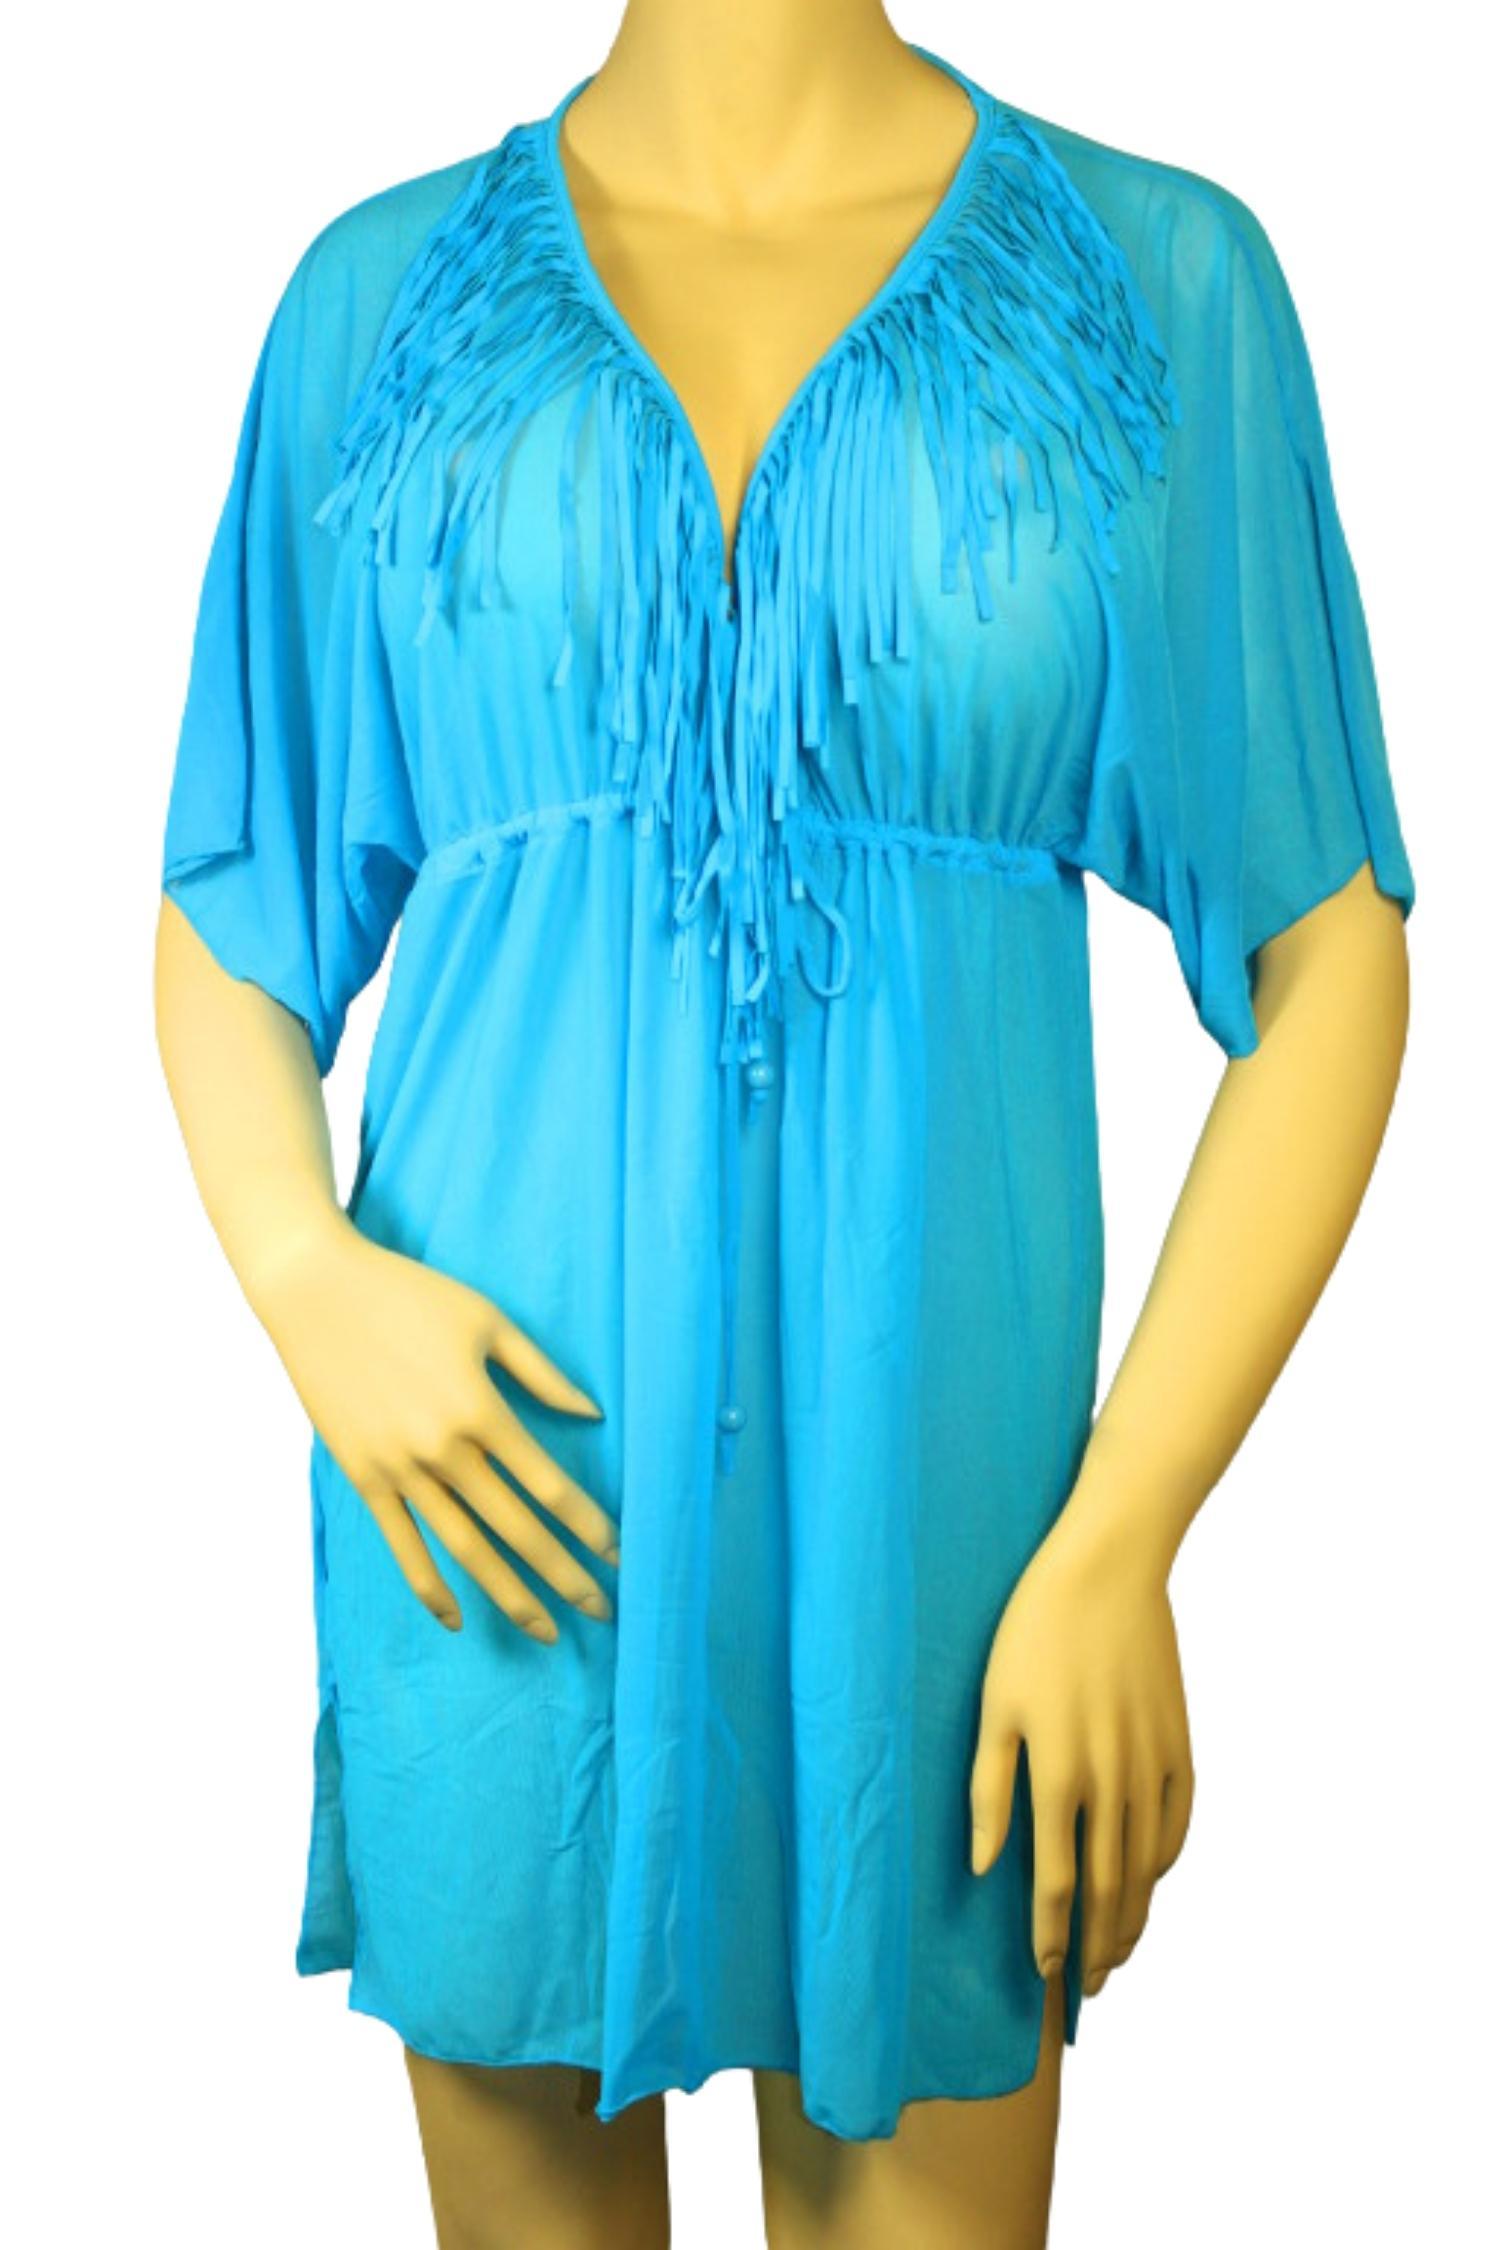 Gabana Blue šaty na plavky XXL modrá